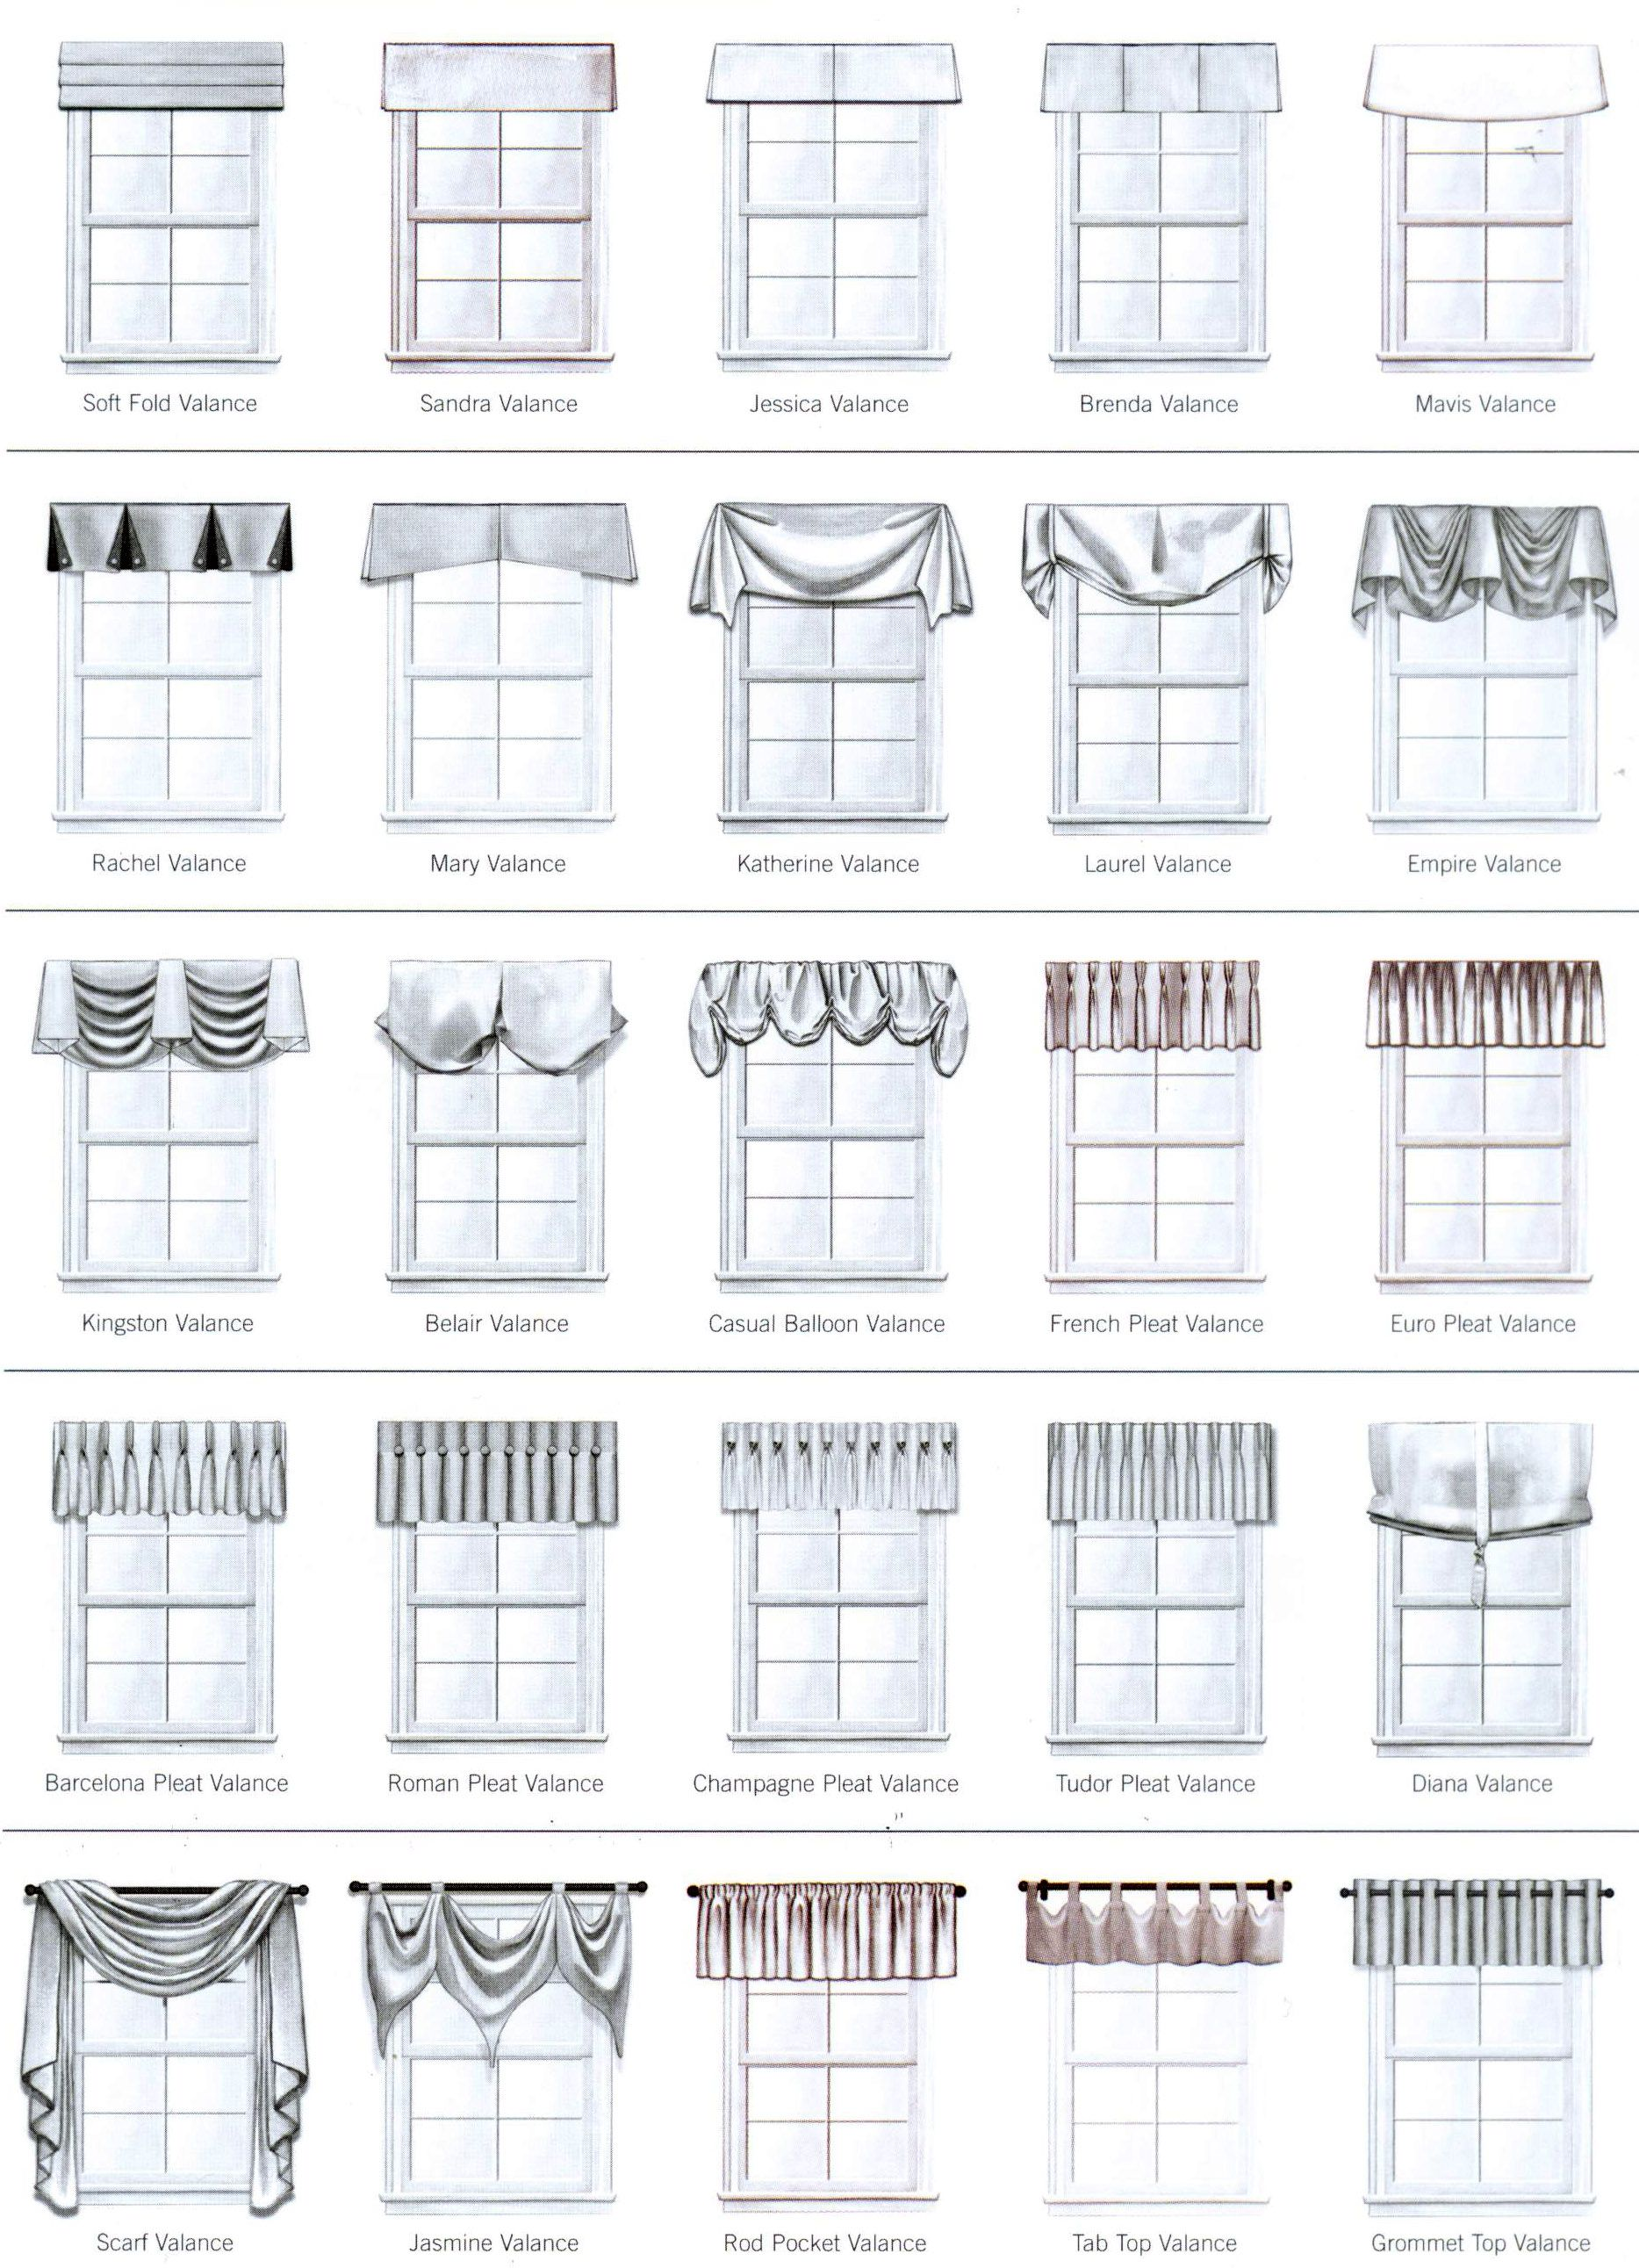 Castec Draperies Castec Valance Styles Valance Window Treatments Drapery Styles Valance Patterns